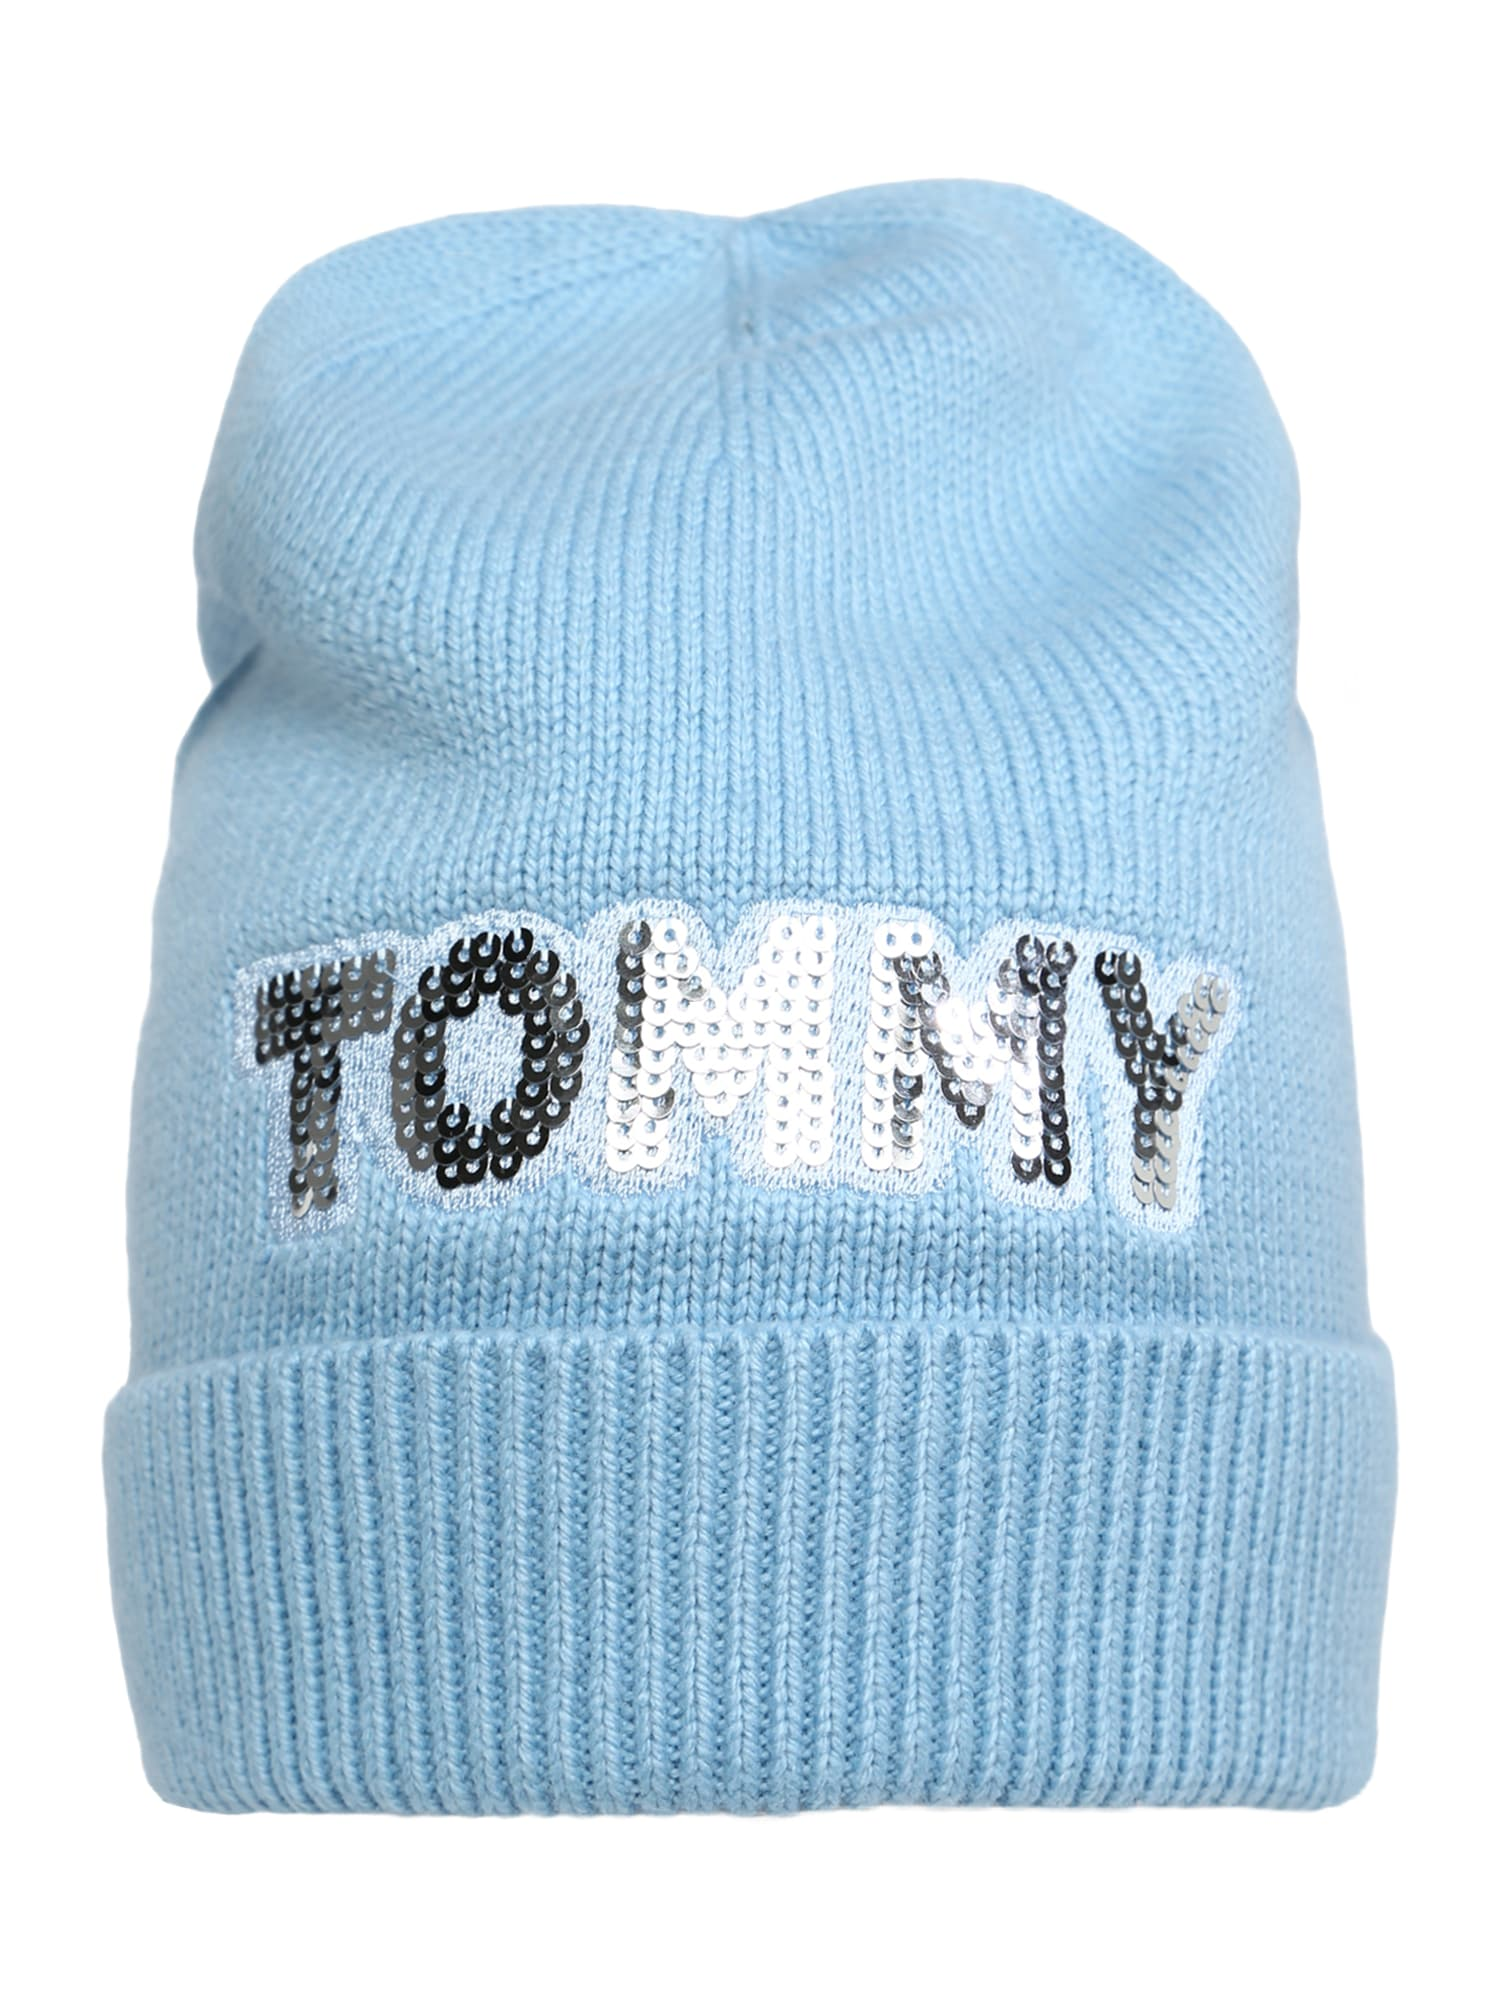 TOMMY HILFIGER, Dames Muts 'TOMMY PATCH', lichtblauw / zilver